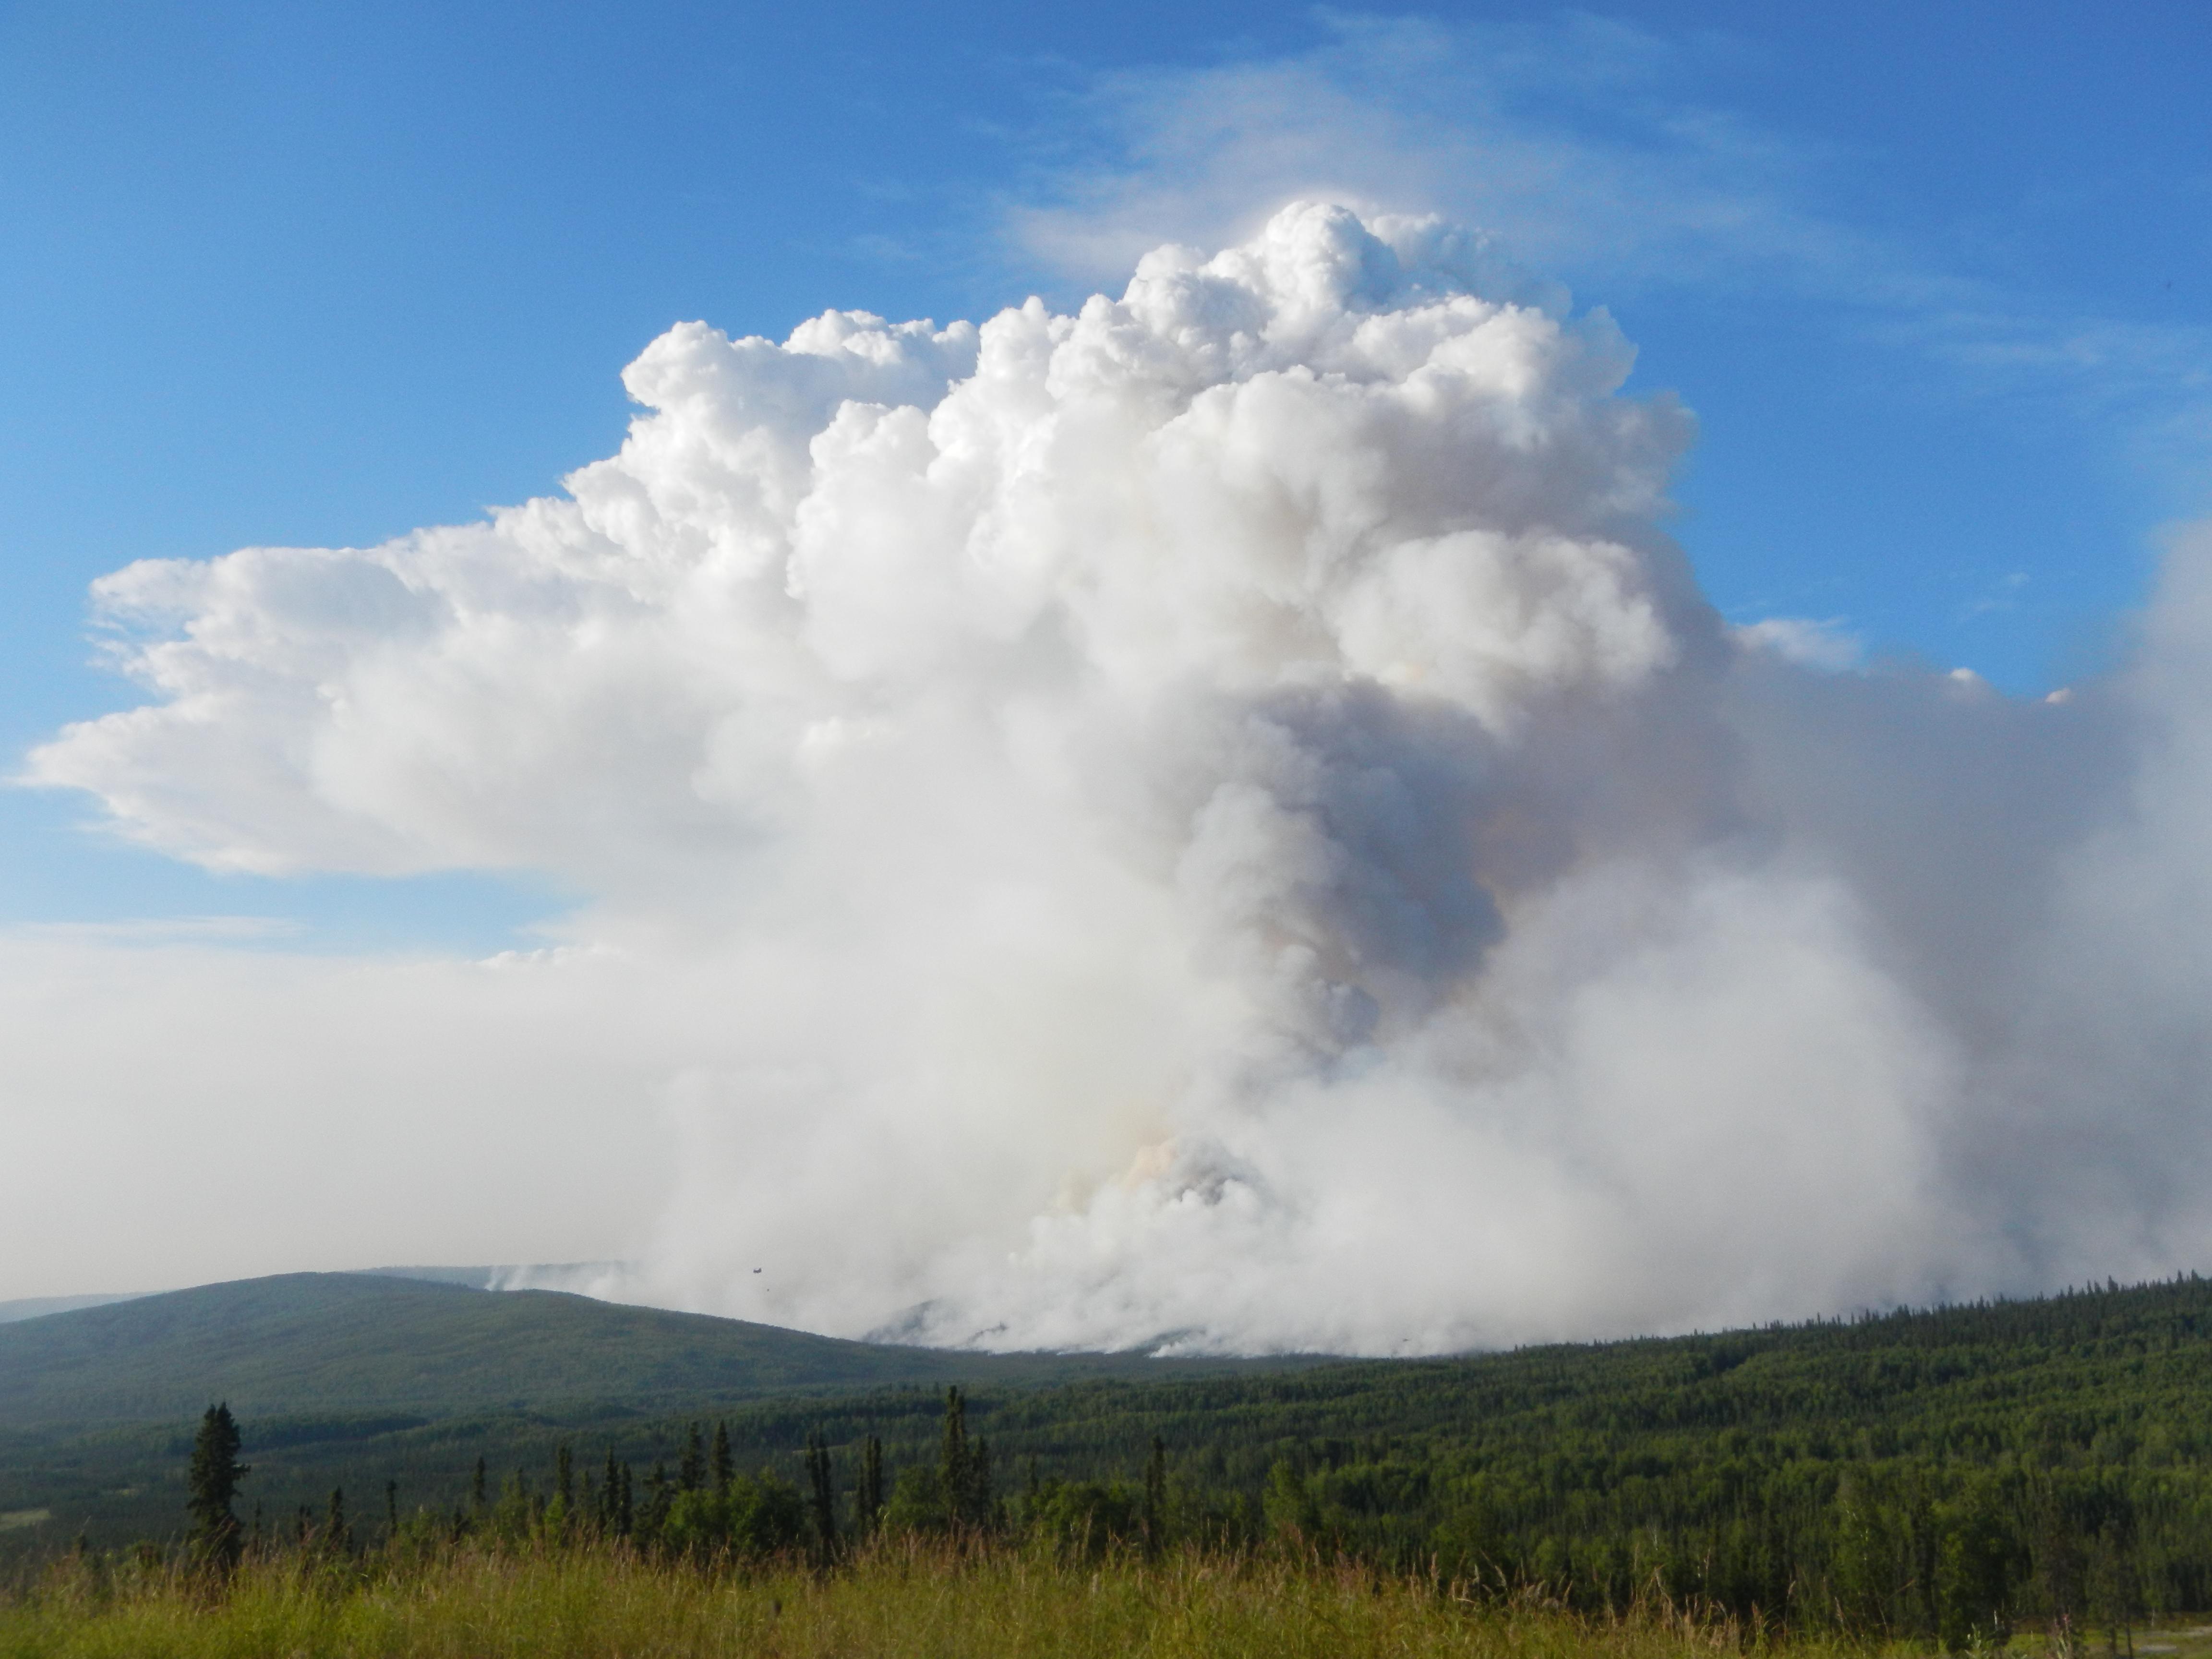 The plume of smoke above the Stuart Creek Fire